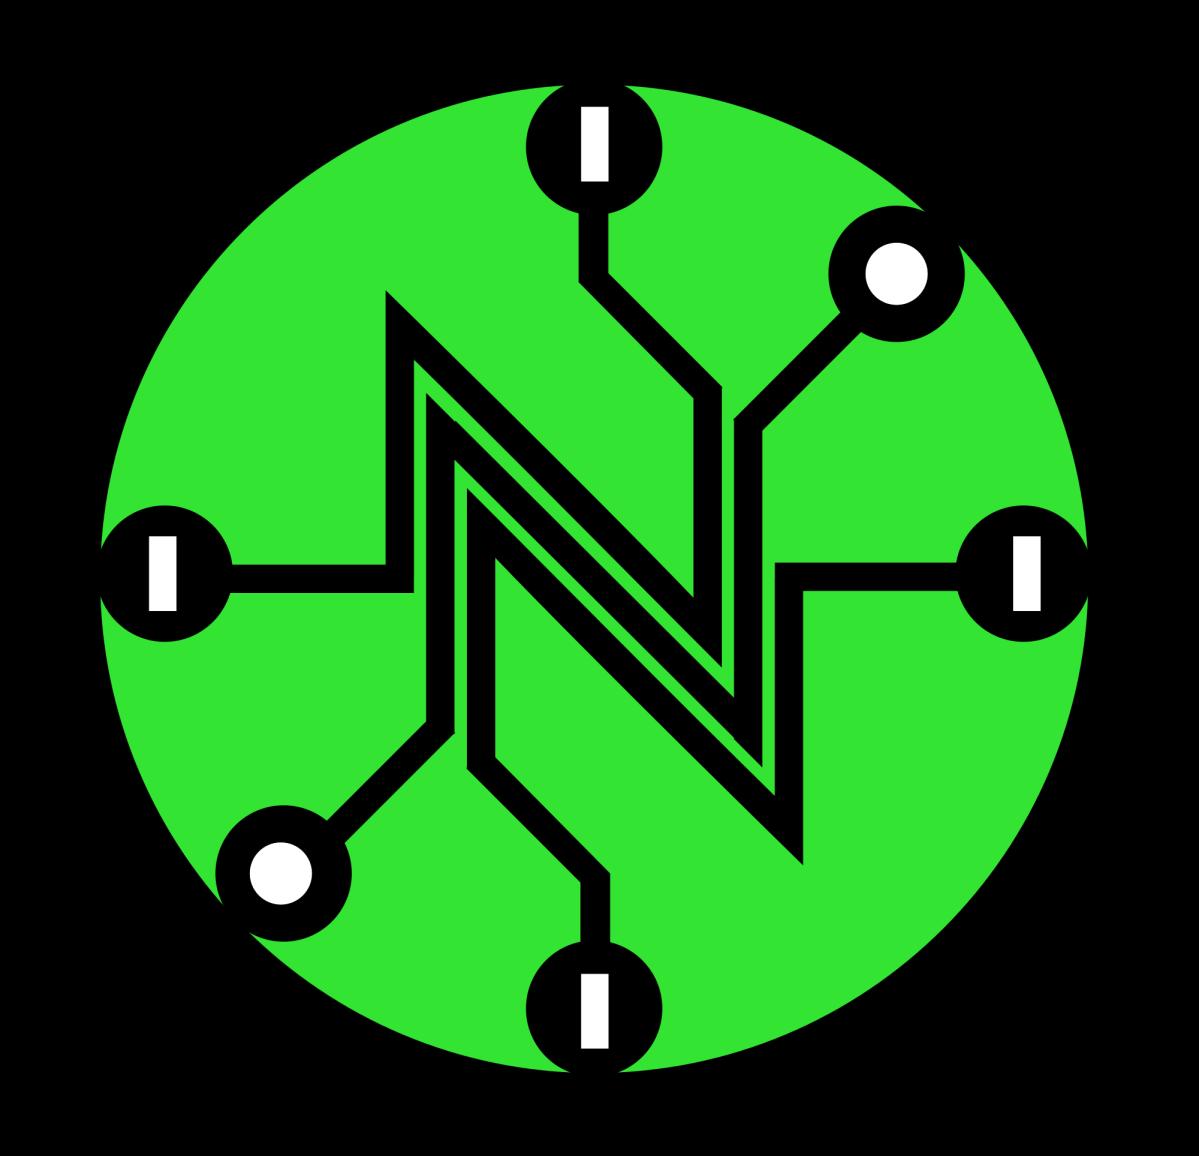 Netneutrality_modern_template_pure_